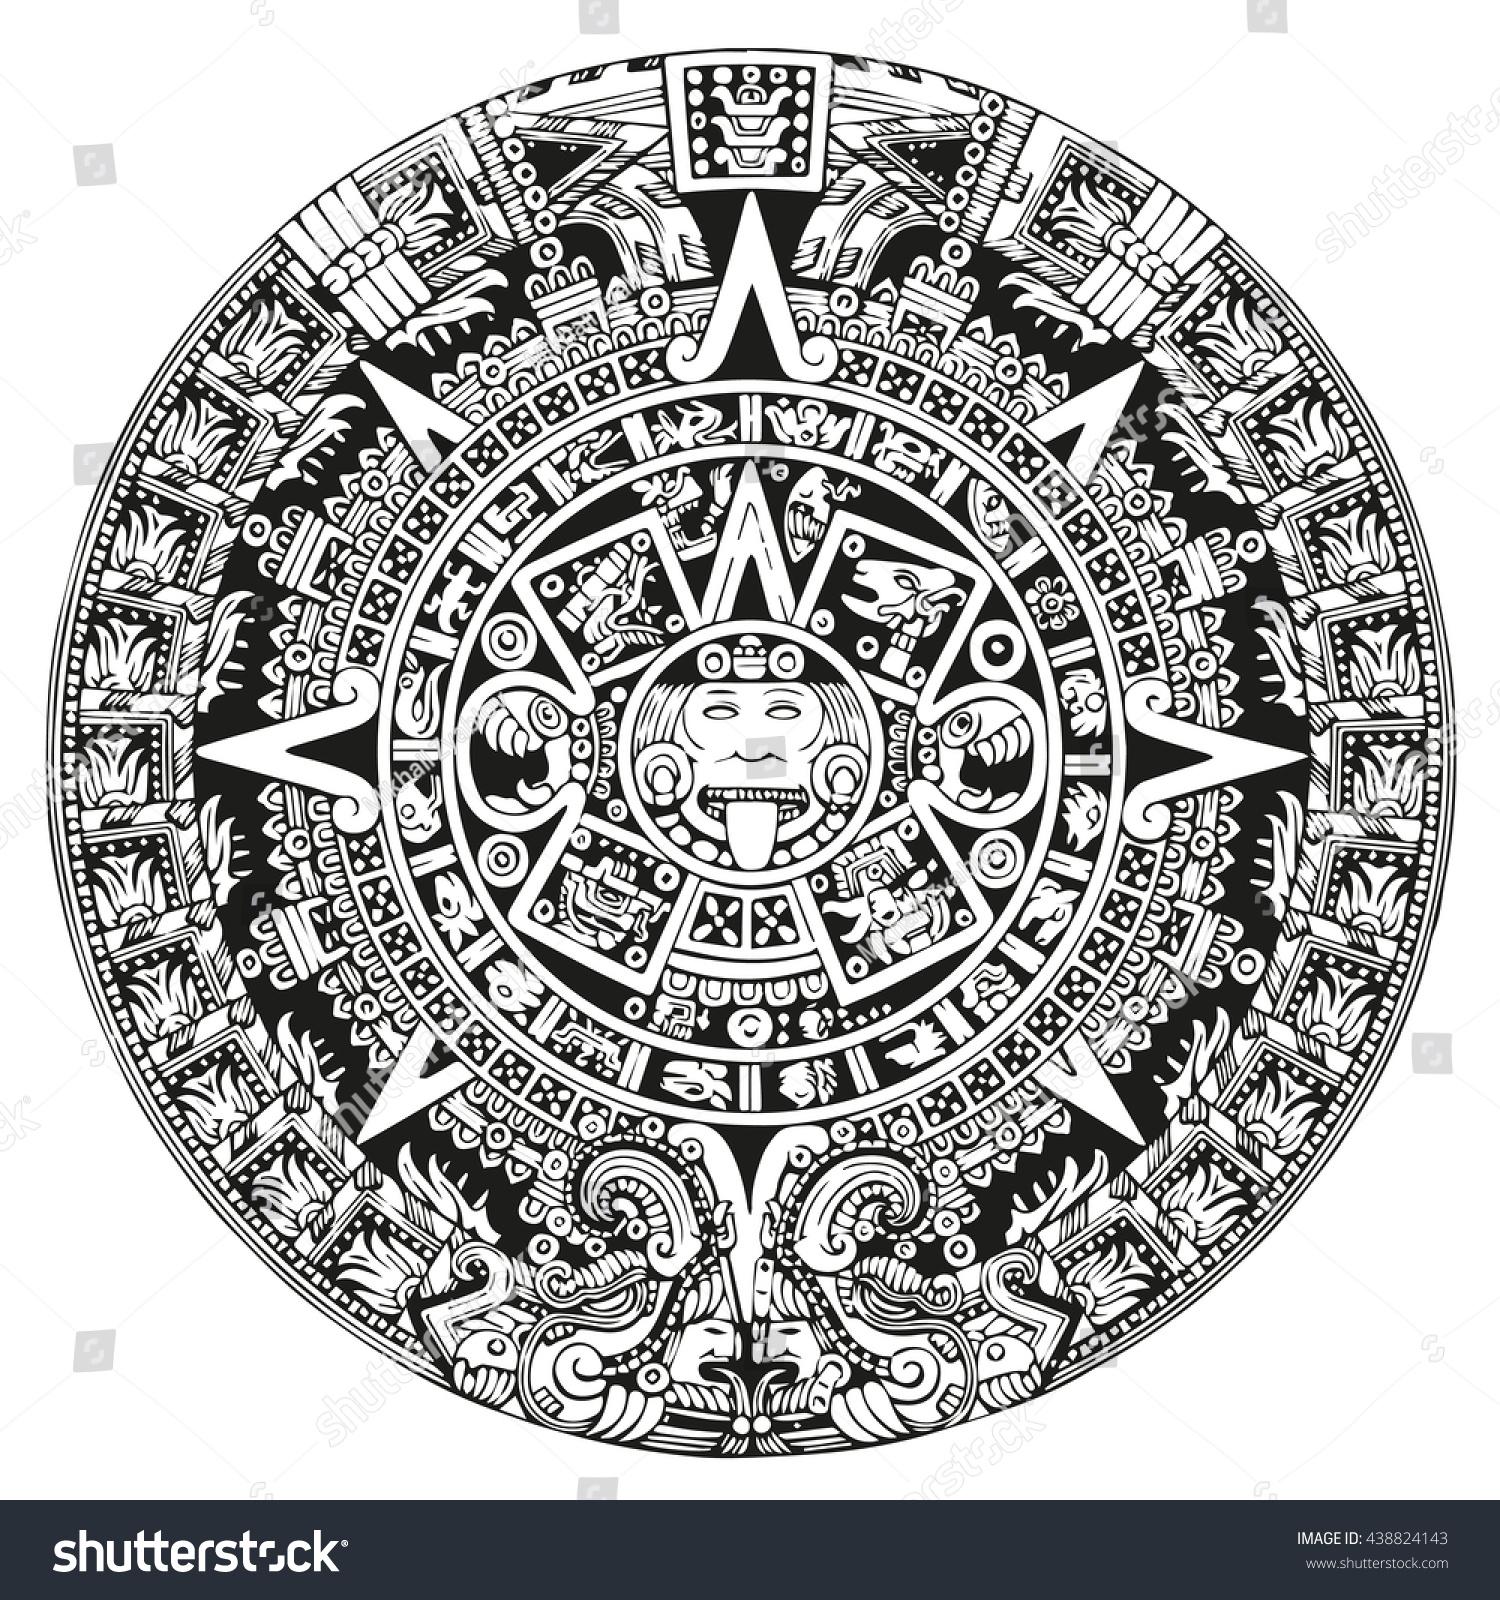 mayan astronomy symbols - photo #14